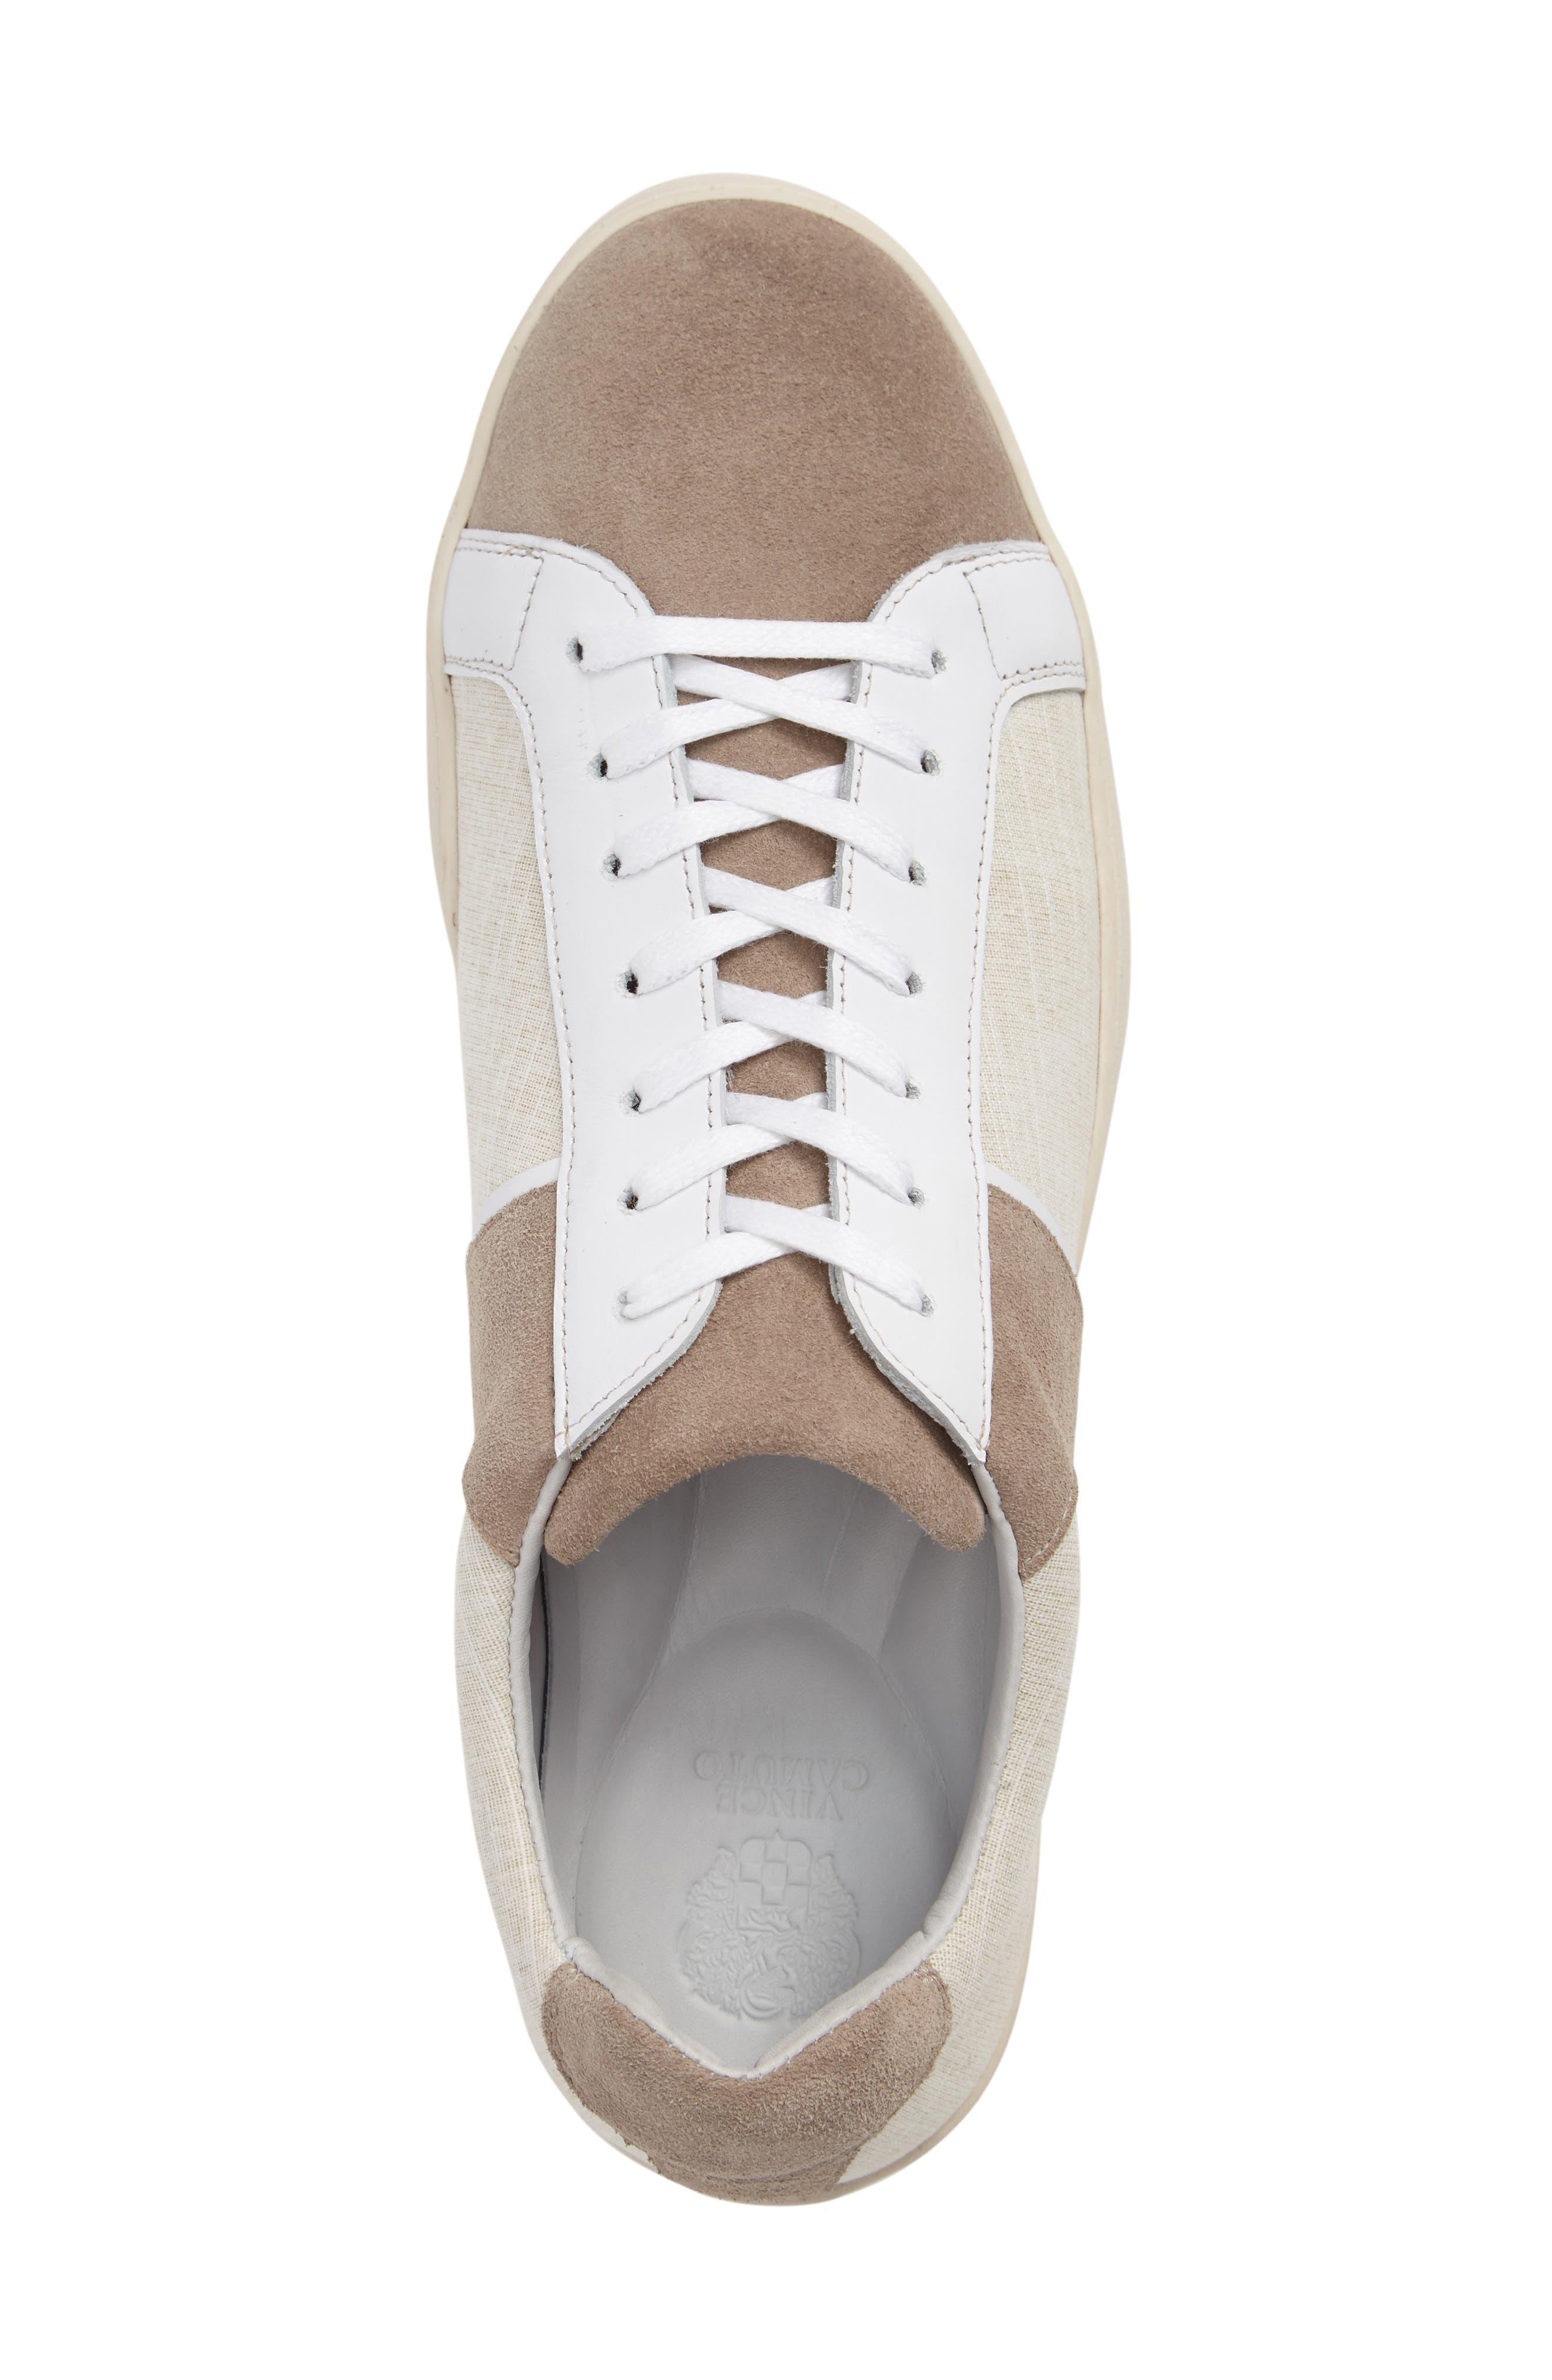 Ginx Sneaker,                             Alternate thumbnail 3, color,                             260